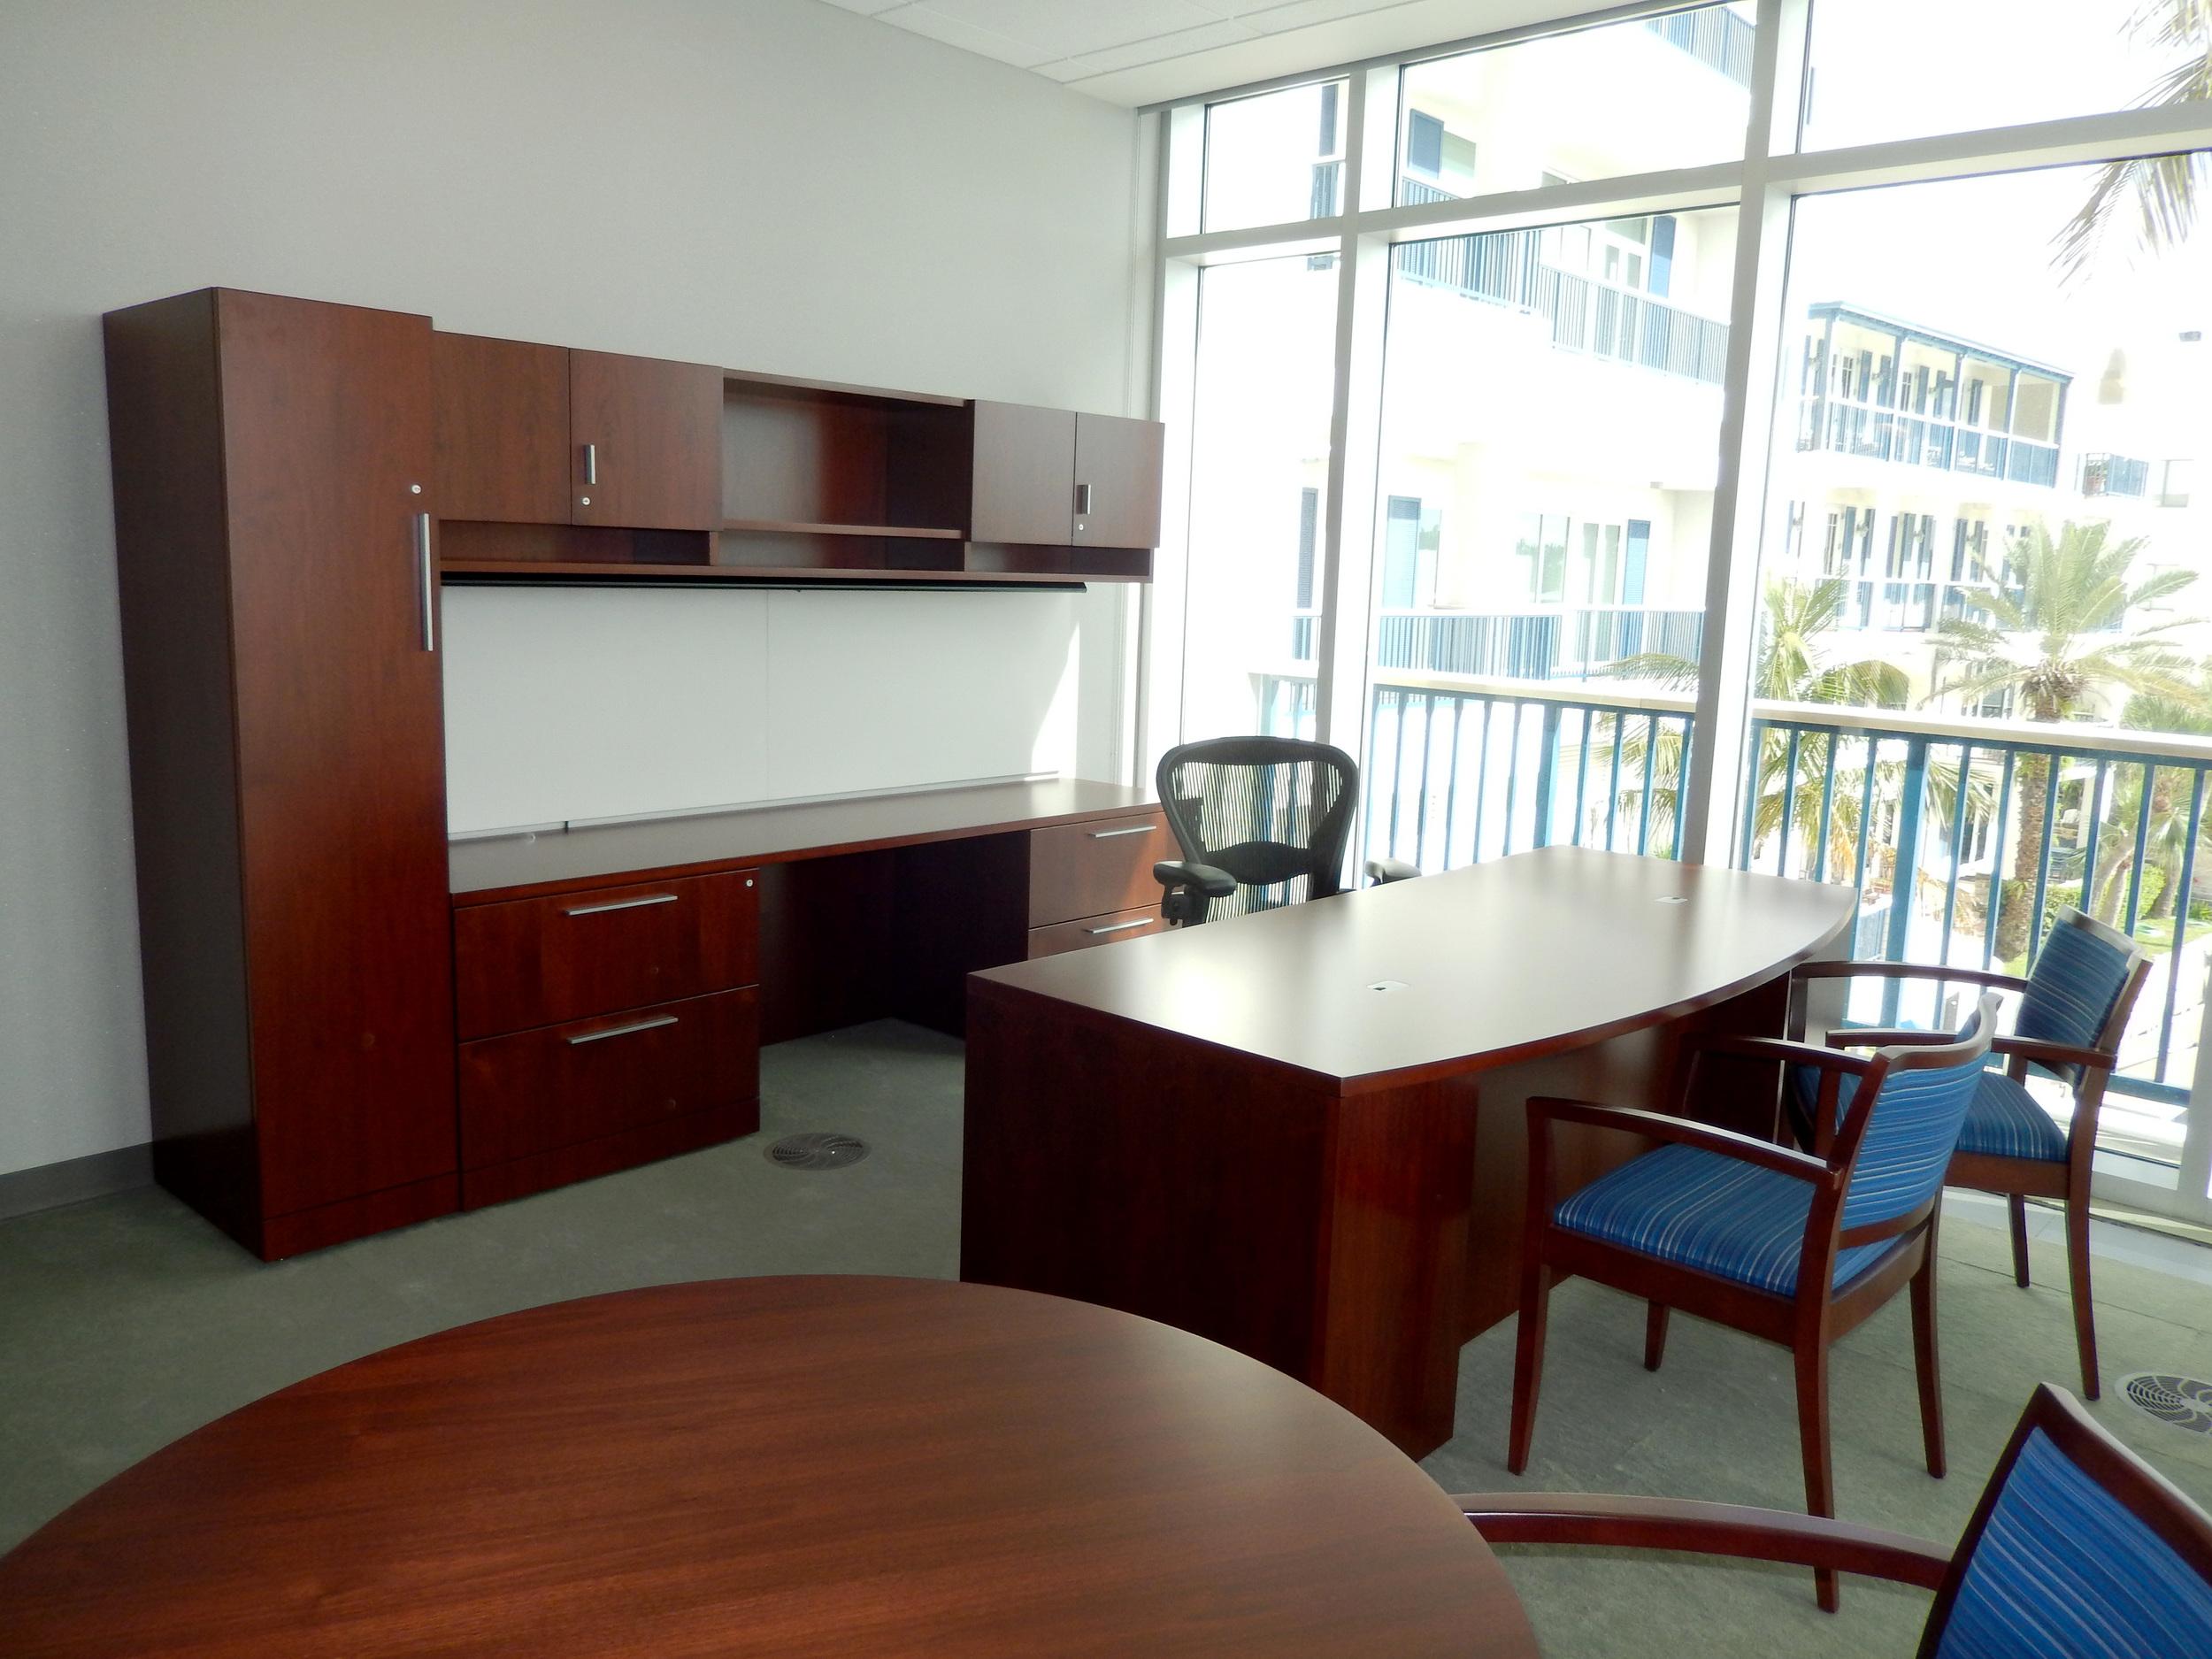 Executive office. Photograph